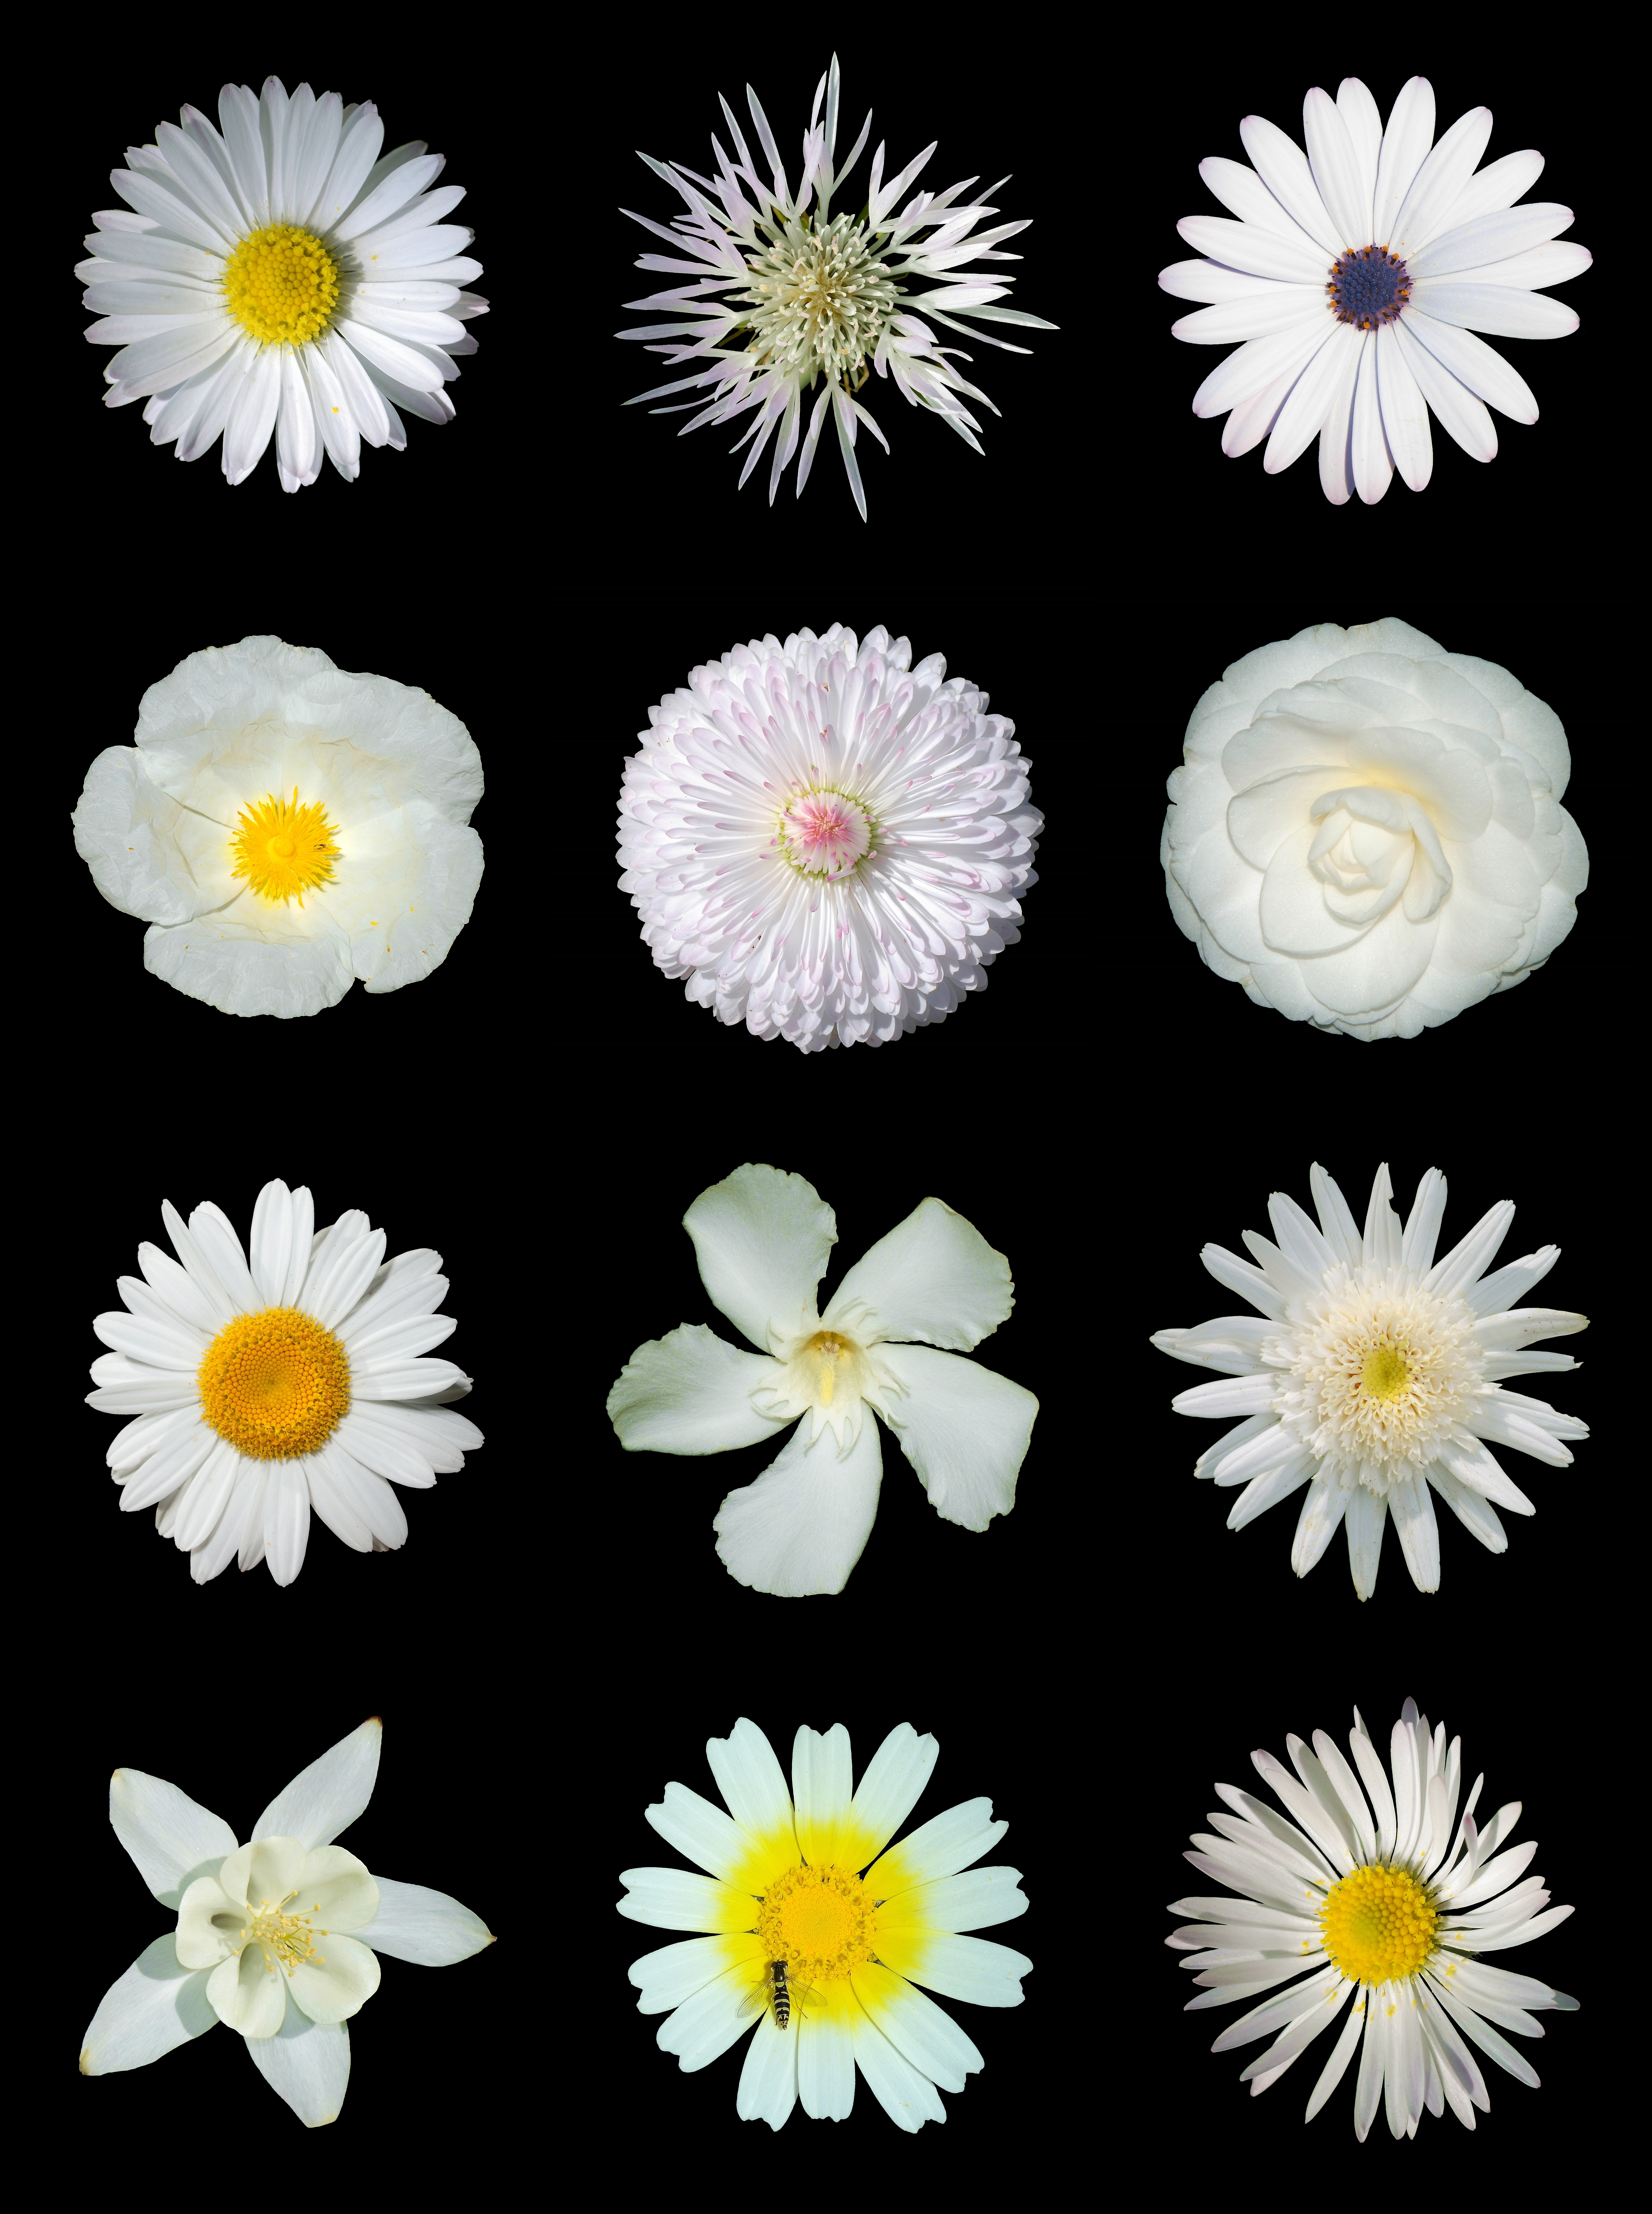 File:White flowers b.jpg - Wikimedia Commons